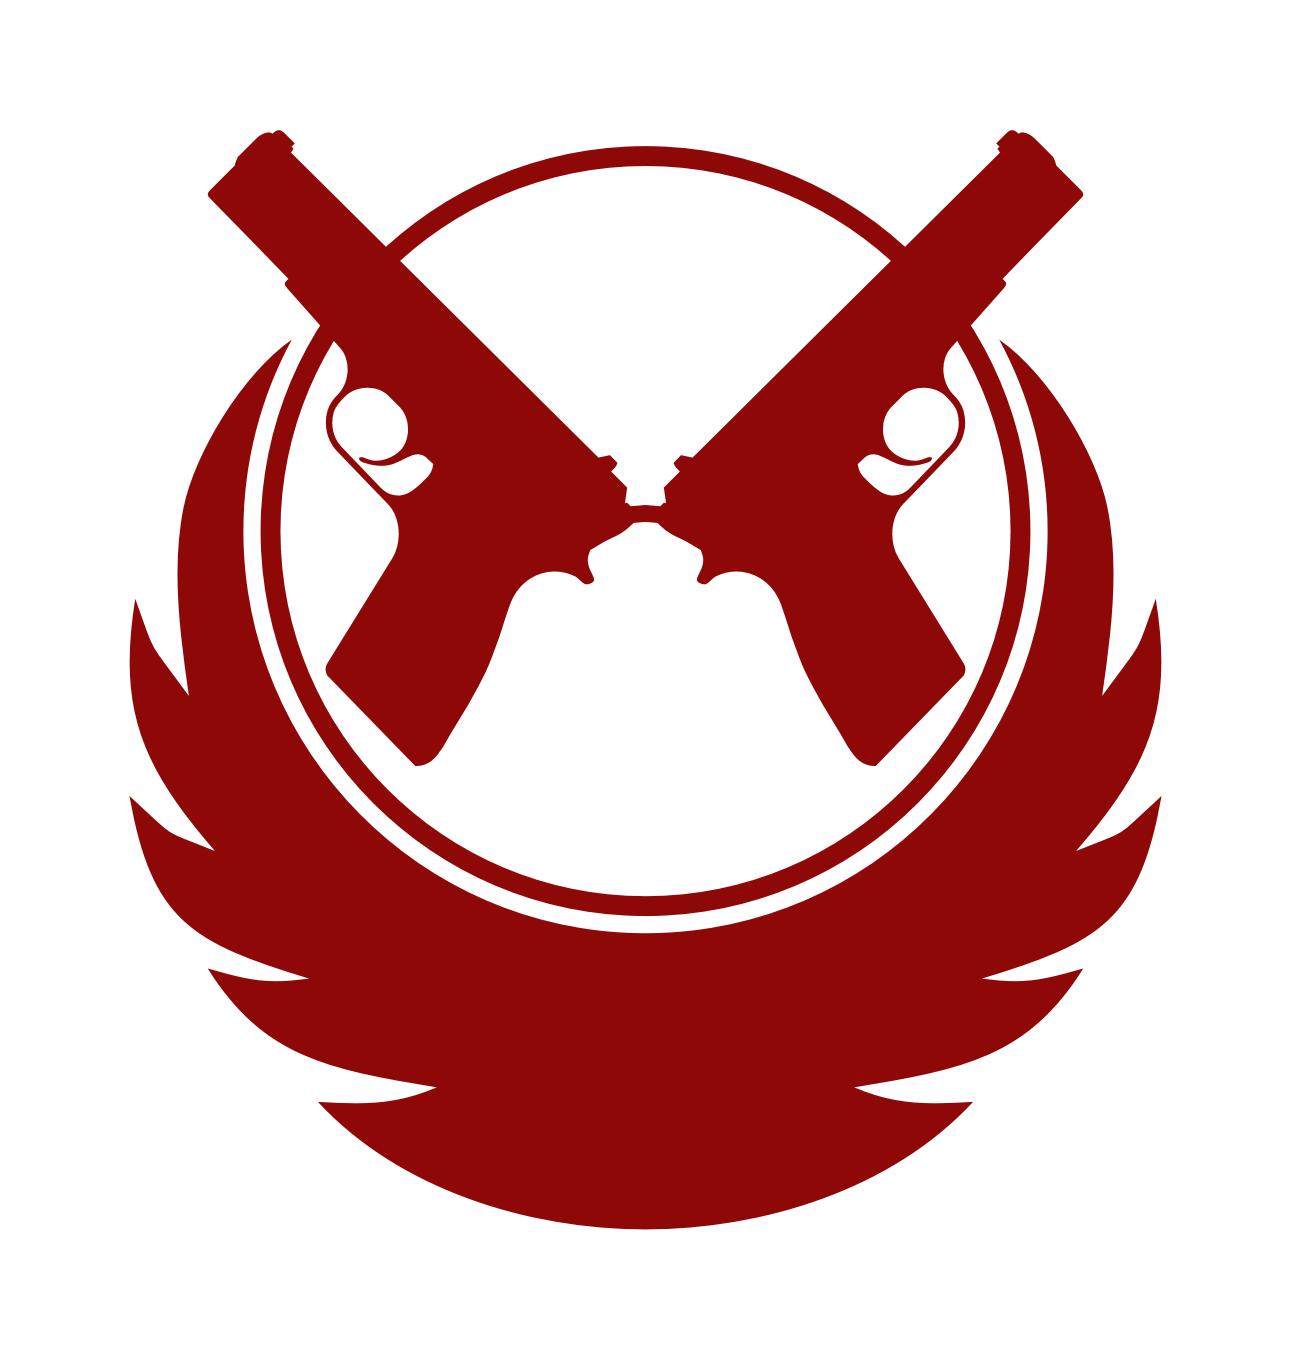 what's the turtle's team logo... ninja turtles or hamato clan ...